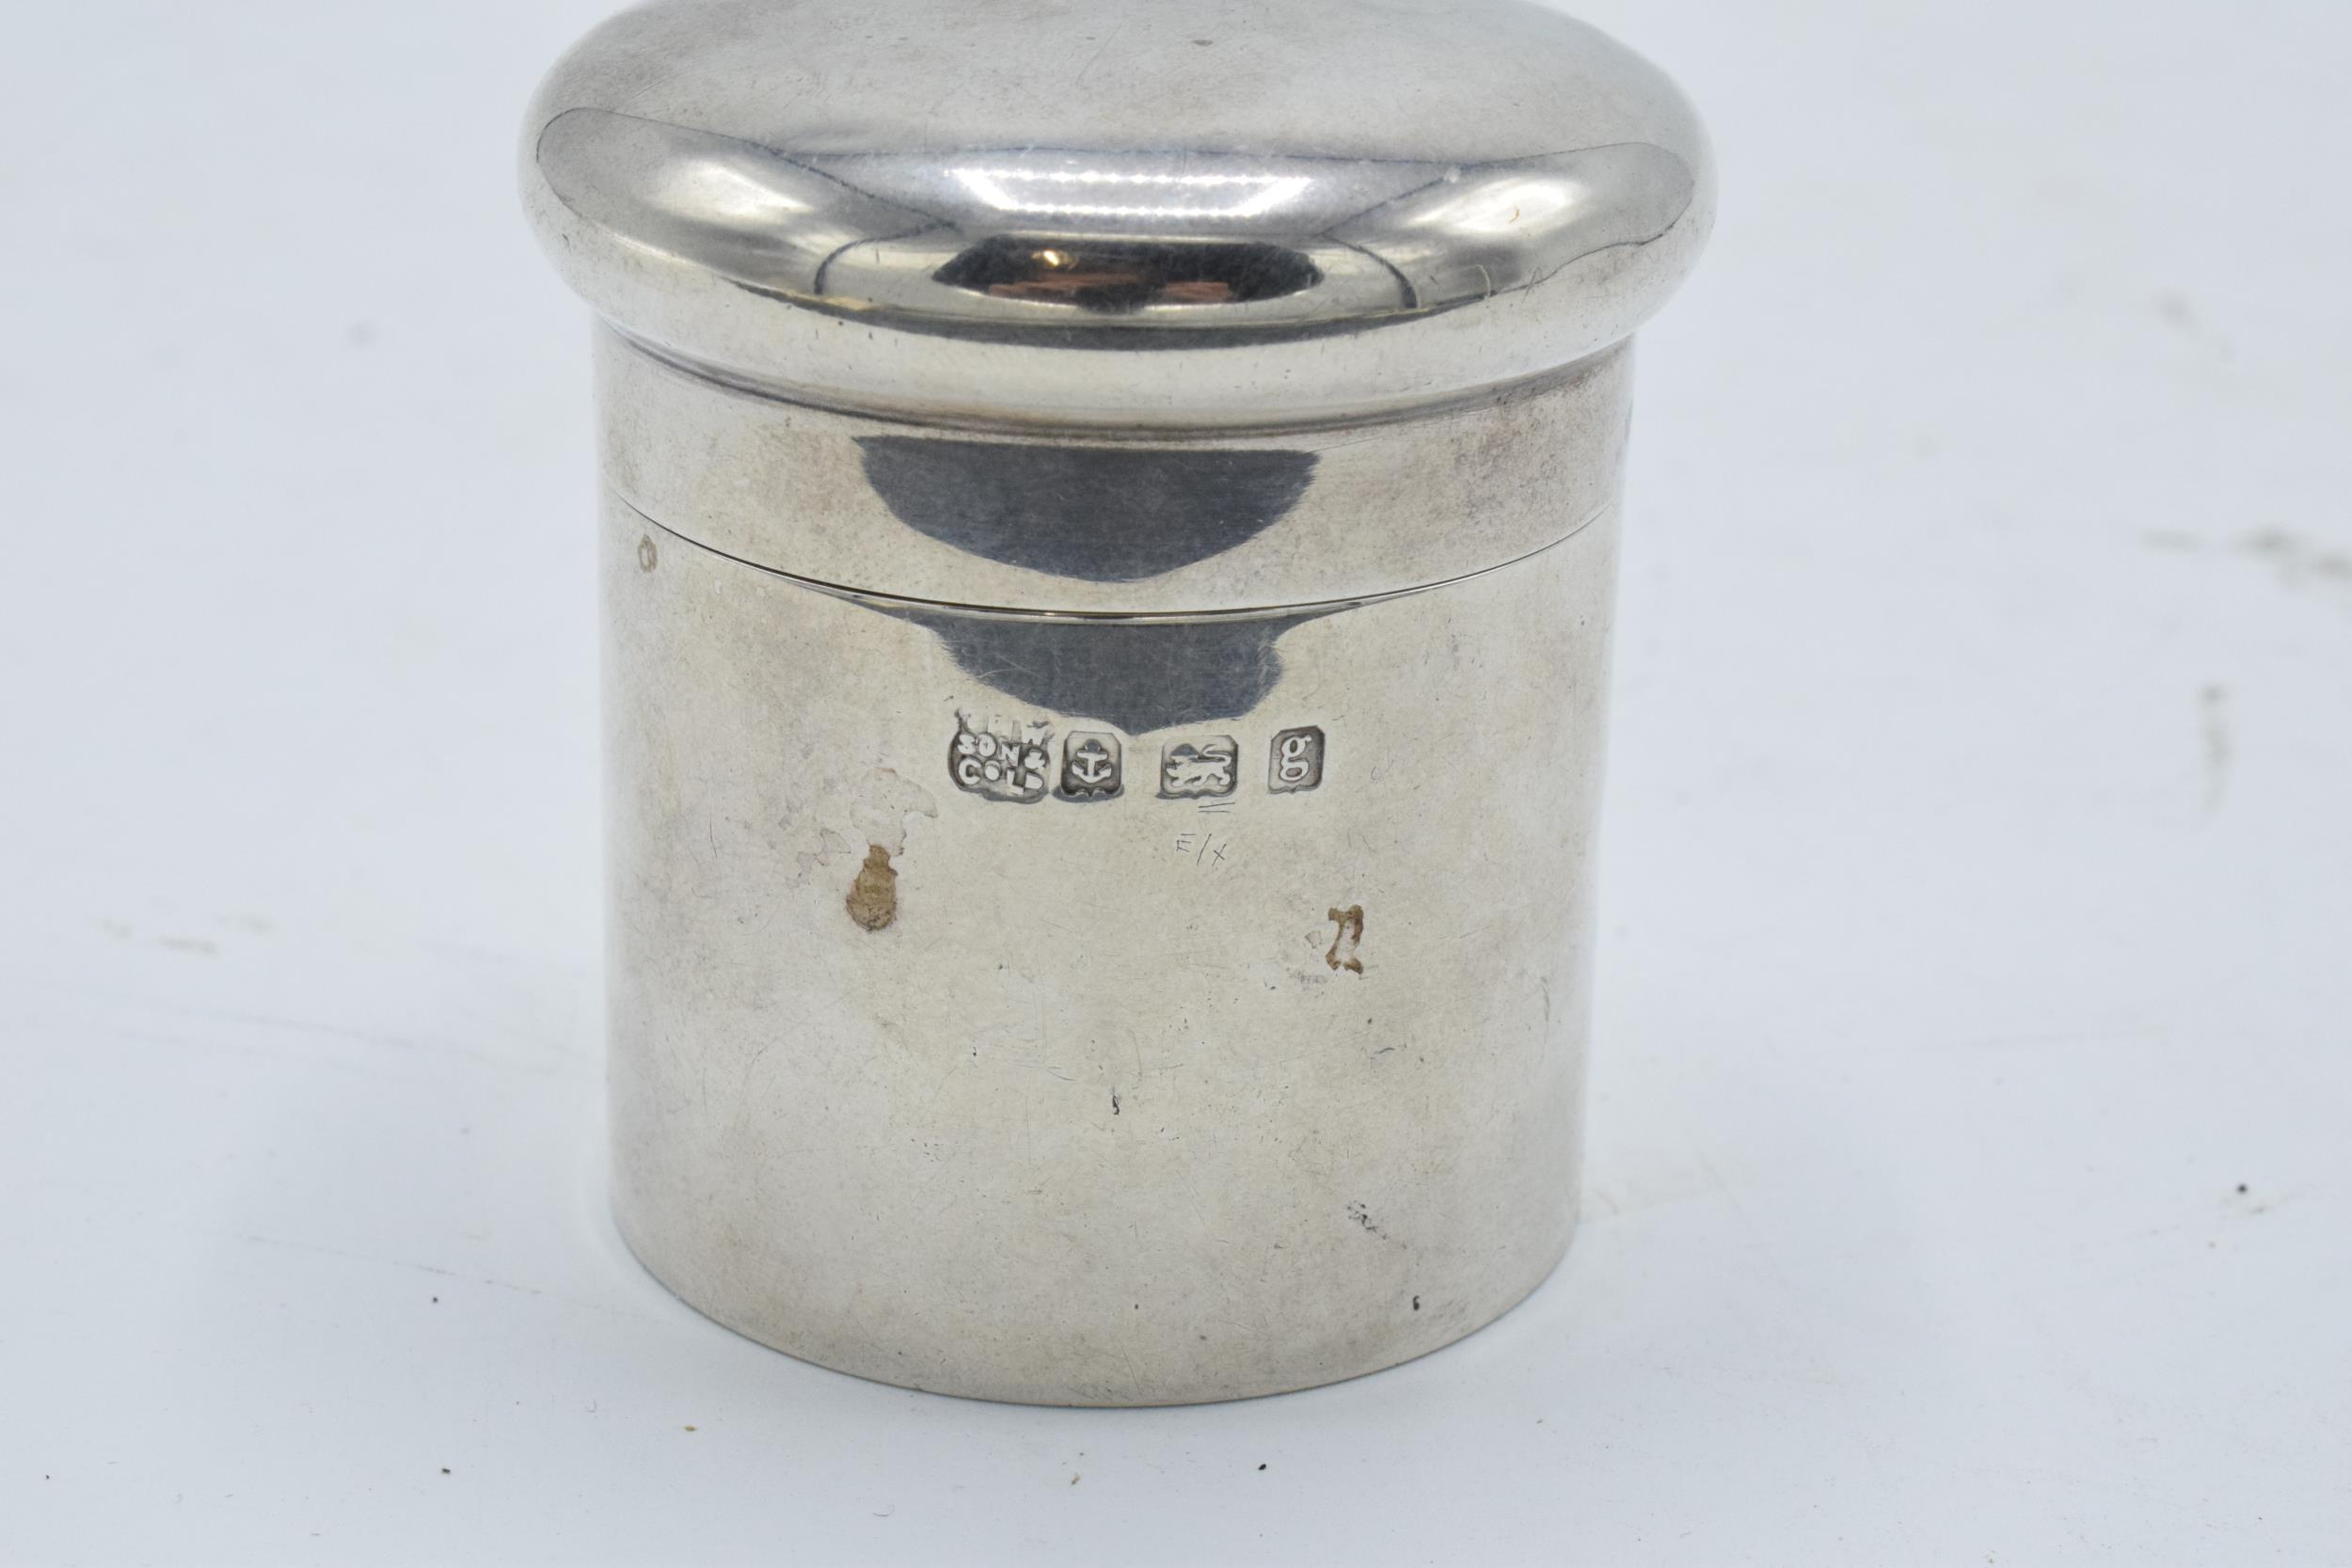 Silver cylindrical lidded pot/ box. Birmingham 1906. 45.4 grams. 5.5cm tall. - Image 3 of 4